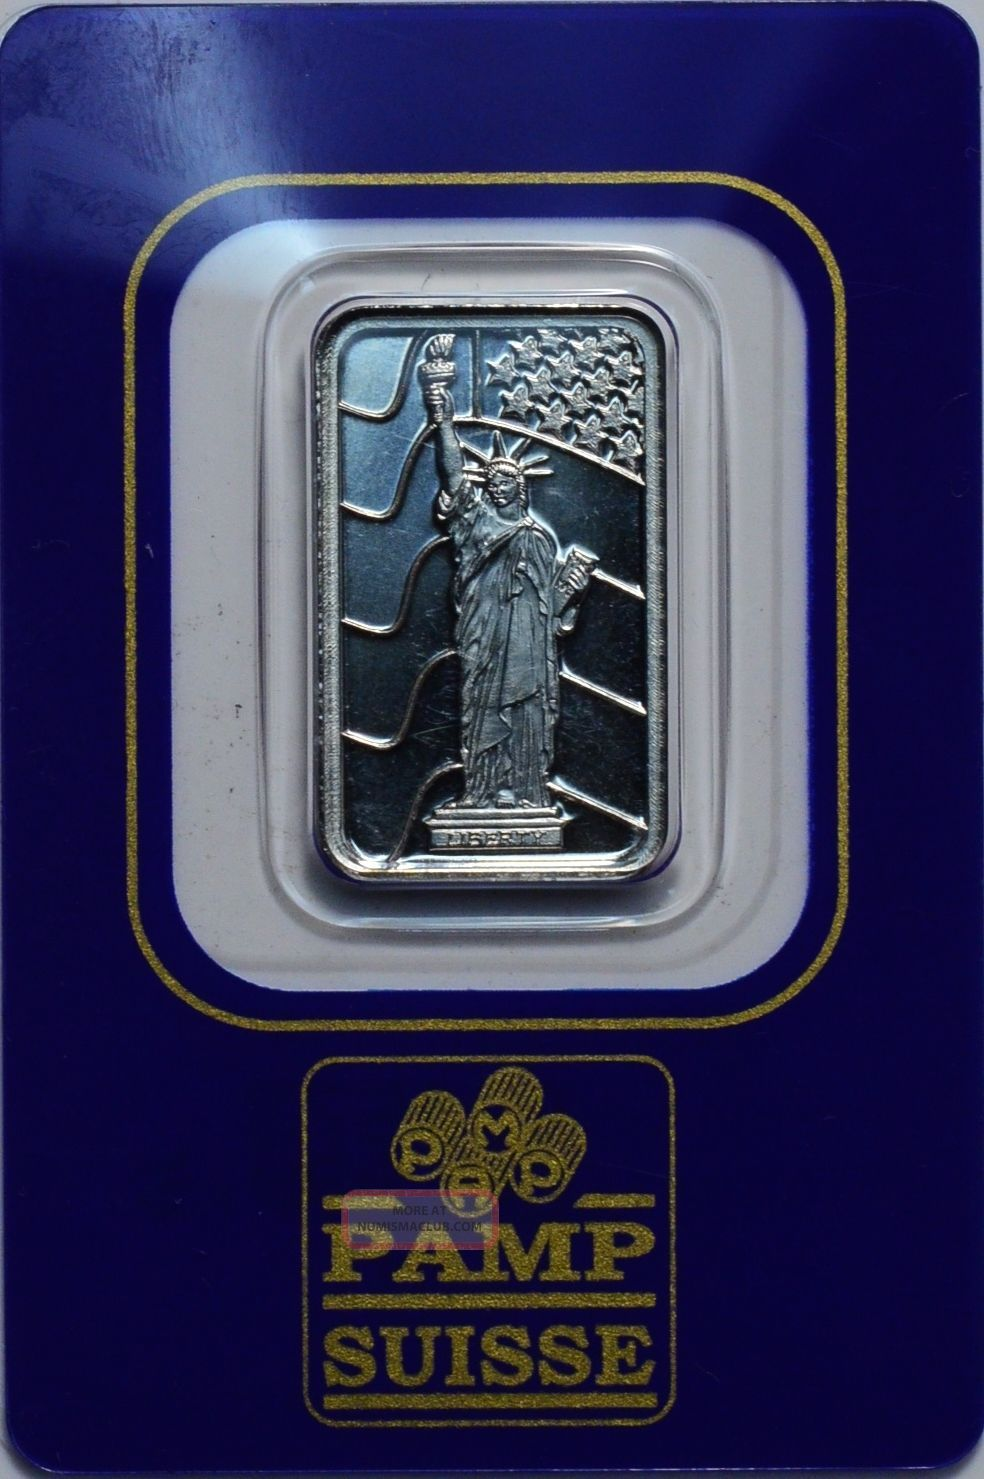 Pamp Suisse 5 Gram 999.  5 Fine Palladium Bar Bullion photo